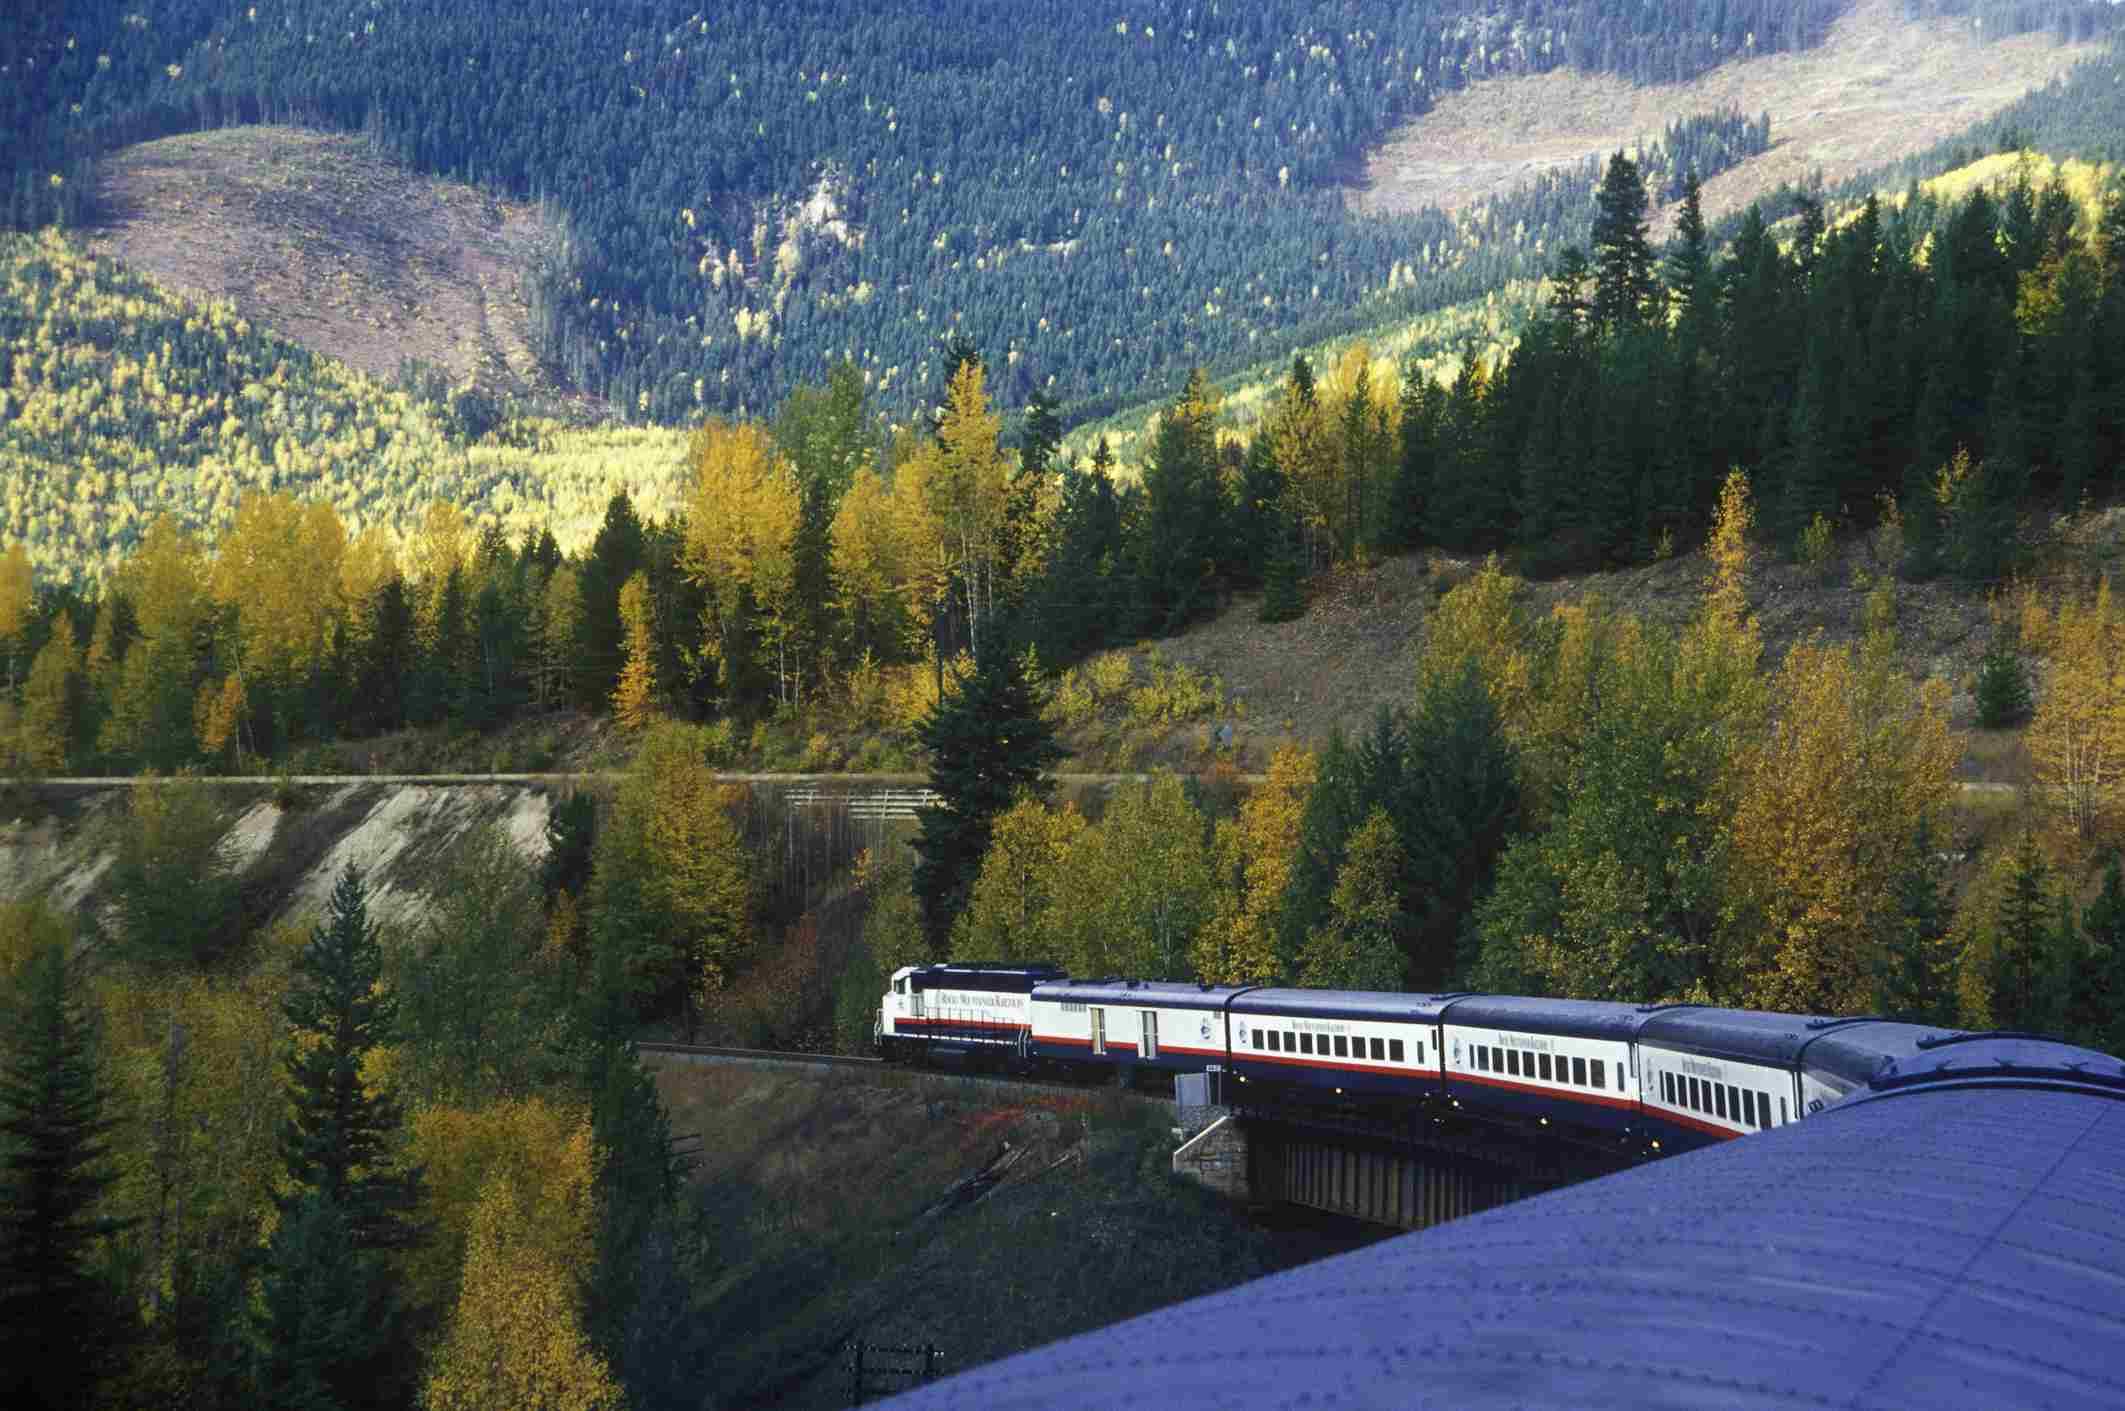 Rocky Mountain Rail Tour train, British Columbia, Canada.